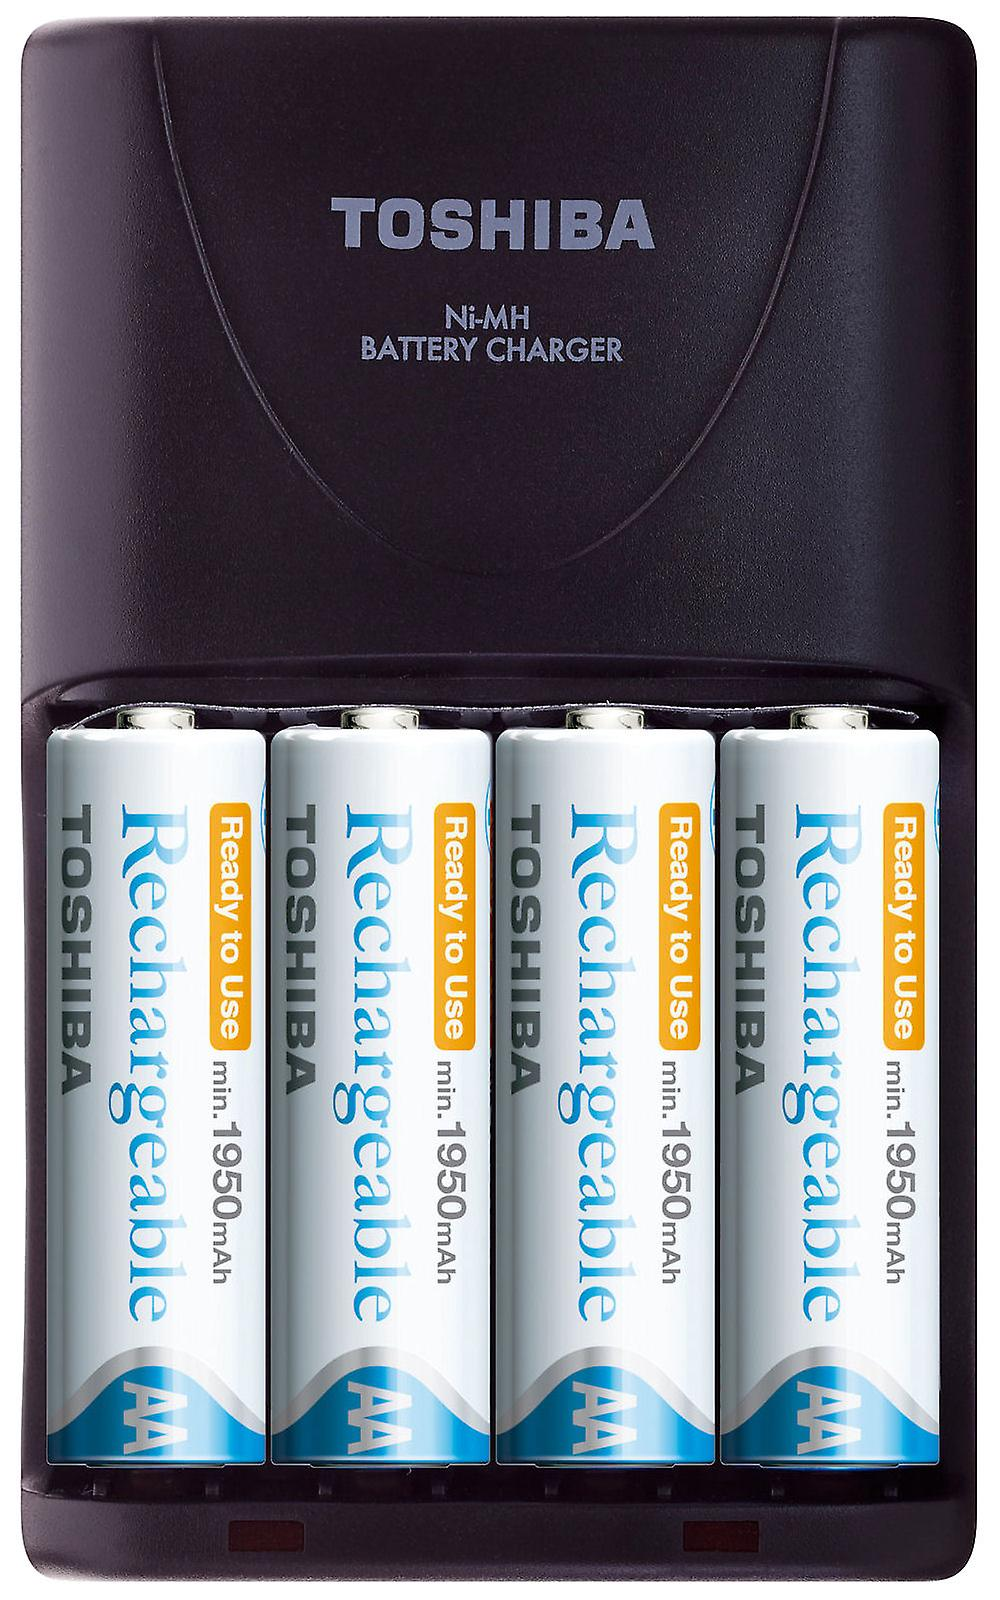 TOSHIBA Charger AA/AAA-type batteries + 4 AA Rechargeable Batteries min. 1950mAh